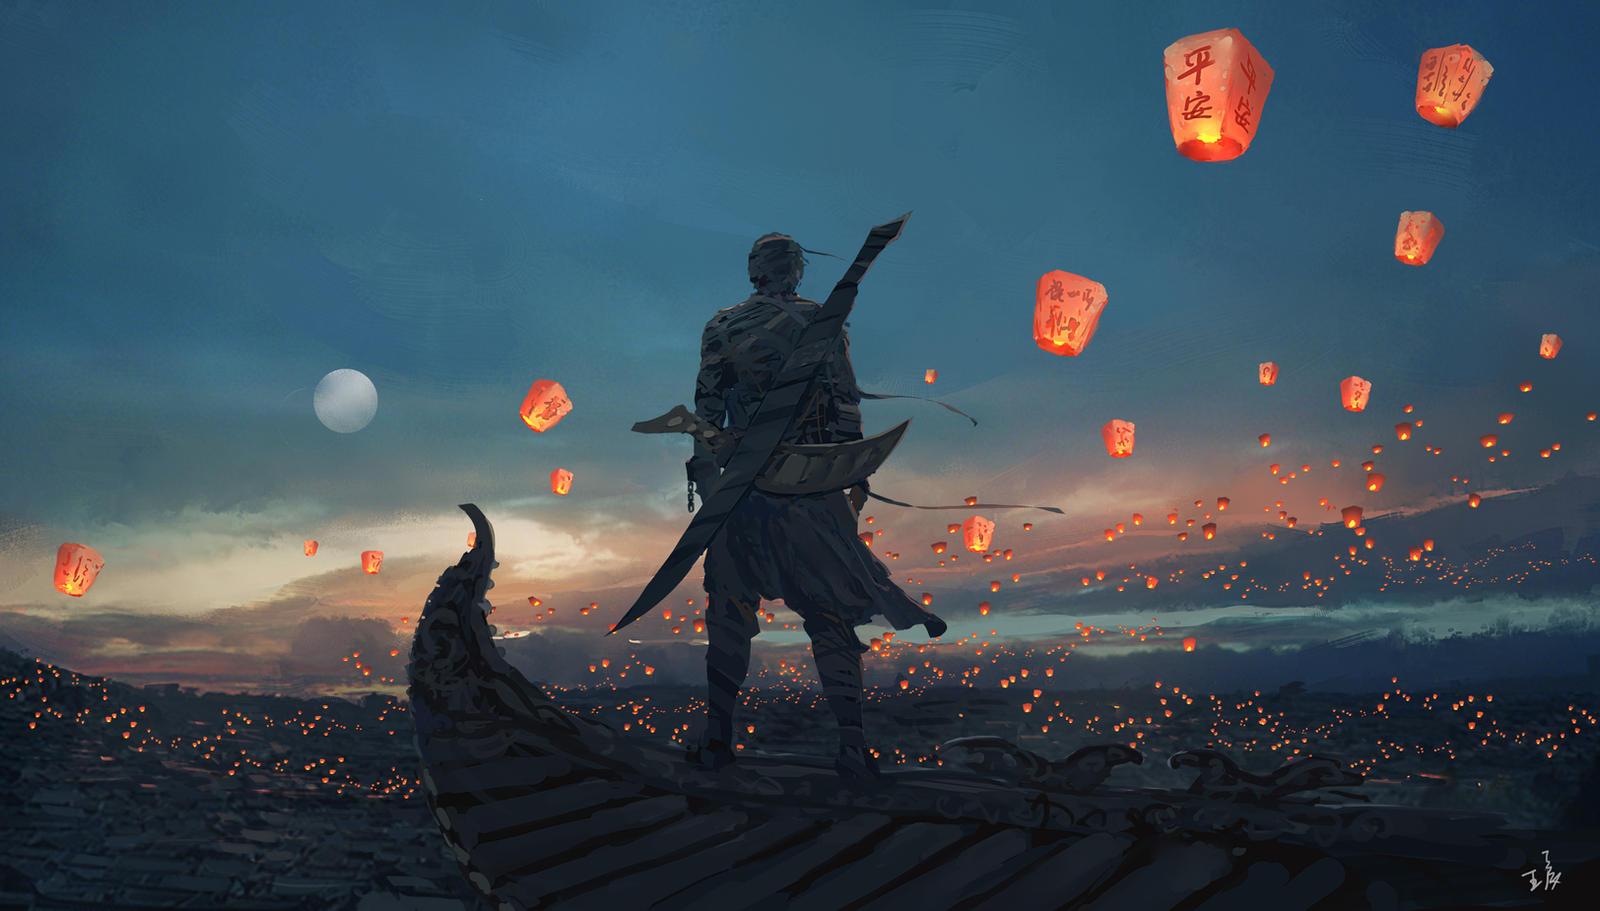 sky lanterns by wlop d7b5nfg